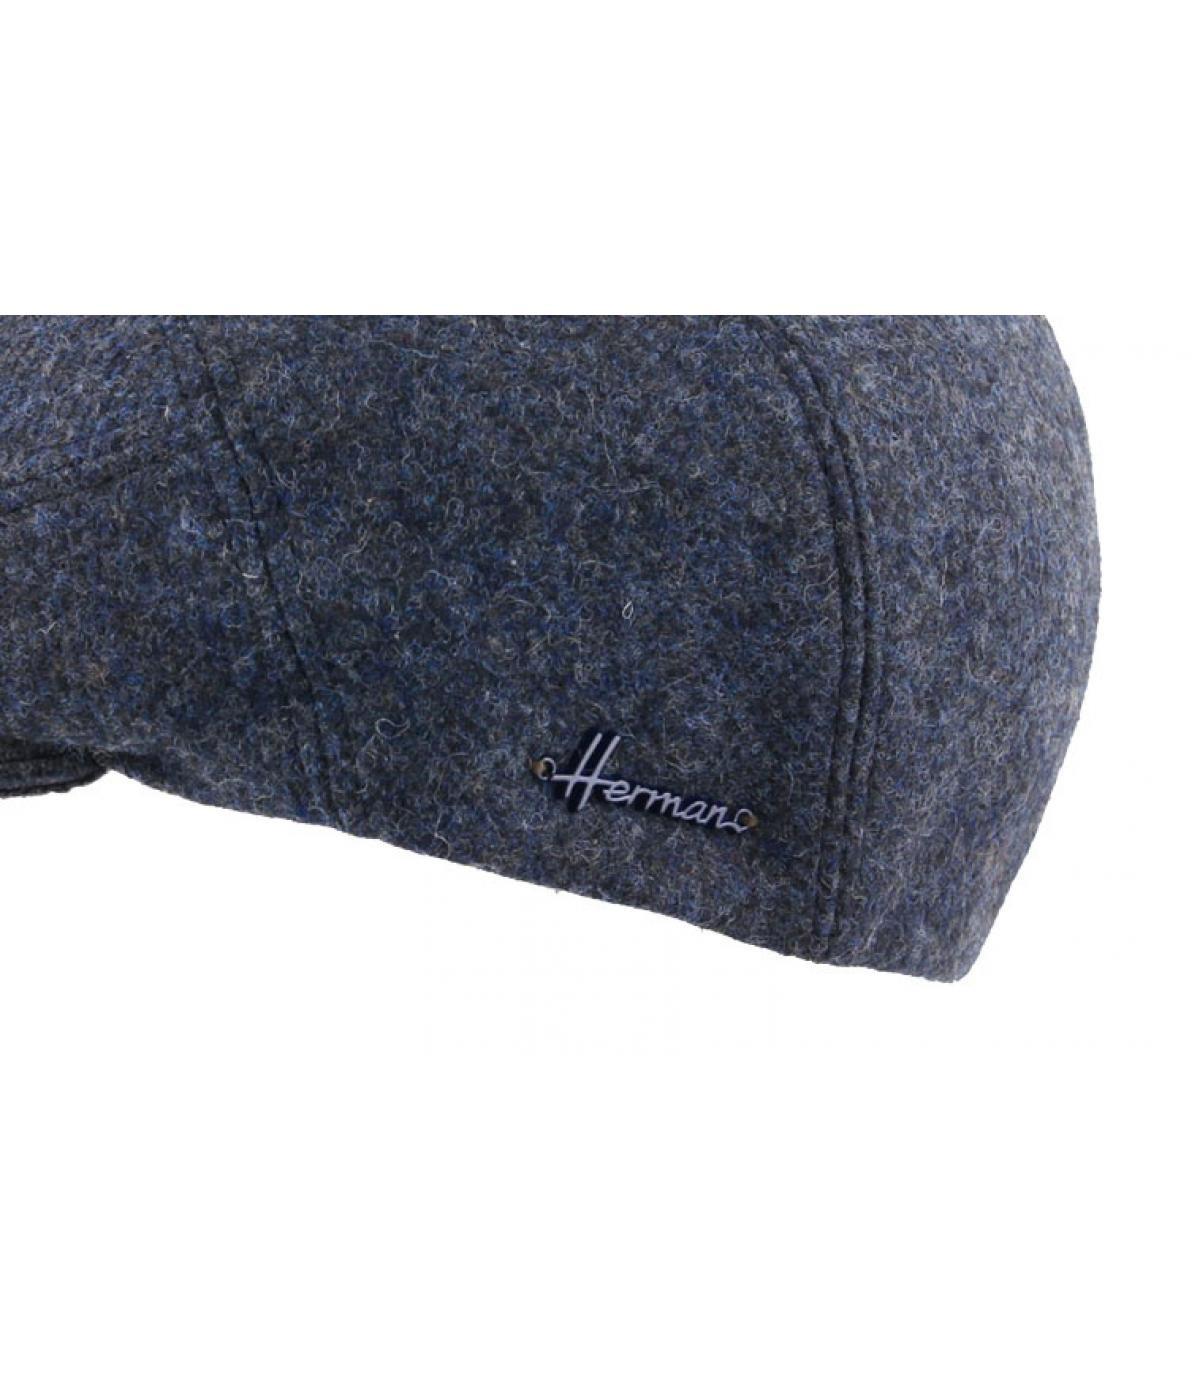 Dettagli Dispatch Wool Corduroy blue - image 3